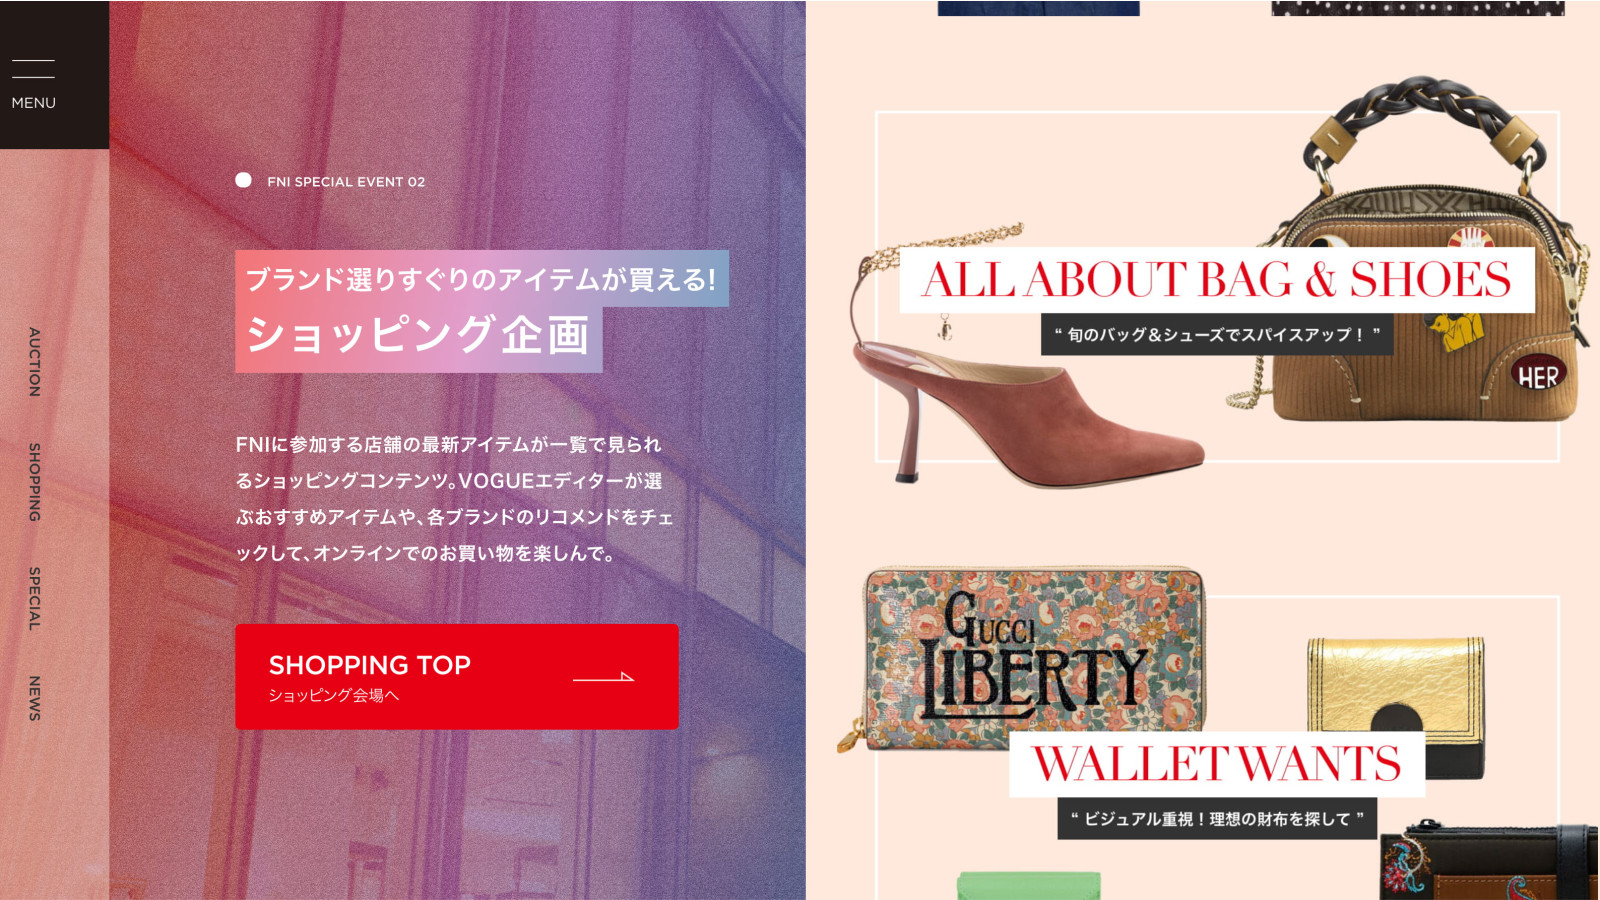 Screen-Shot-2021-03-25-at-5.38.42-PM-vogue-fashion-night-in-japan